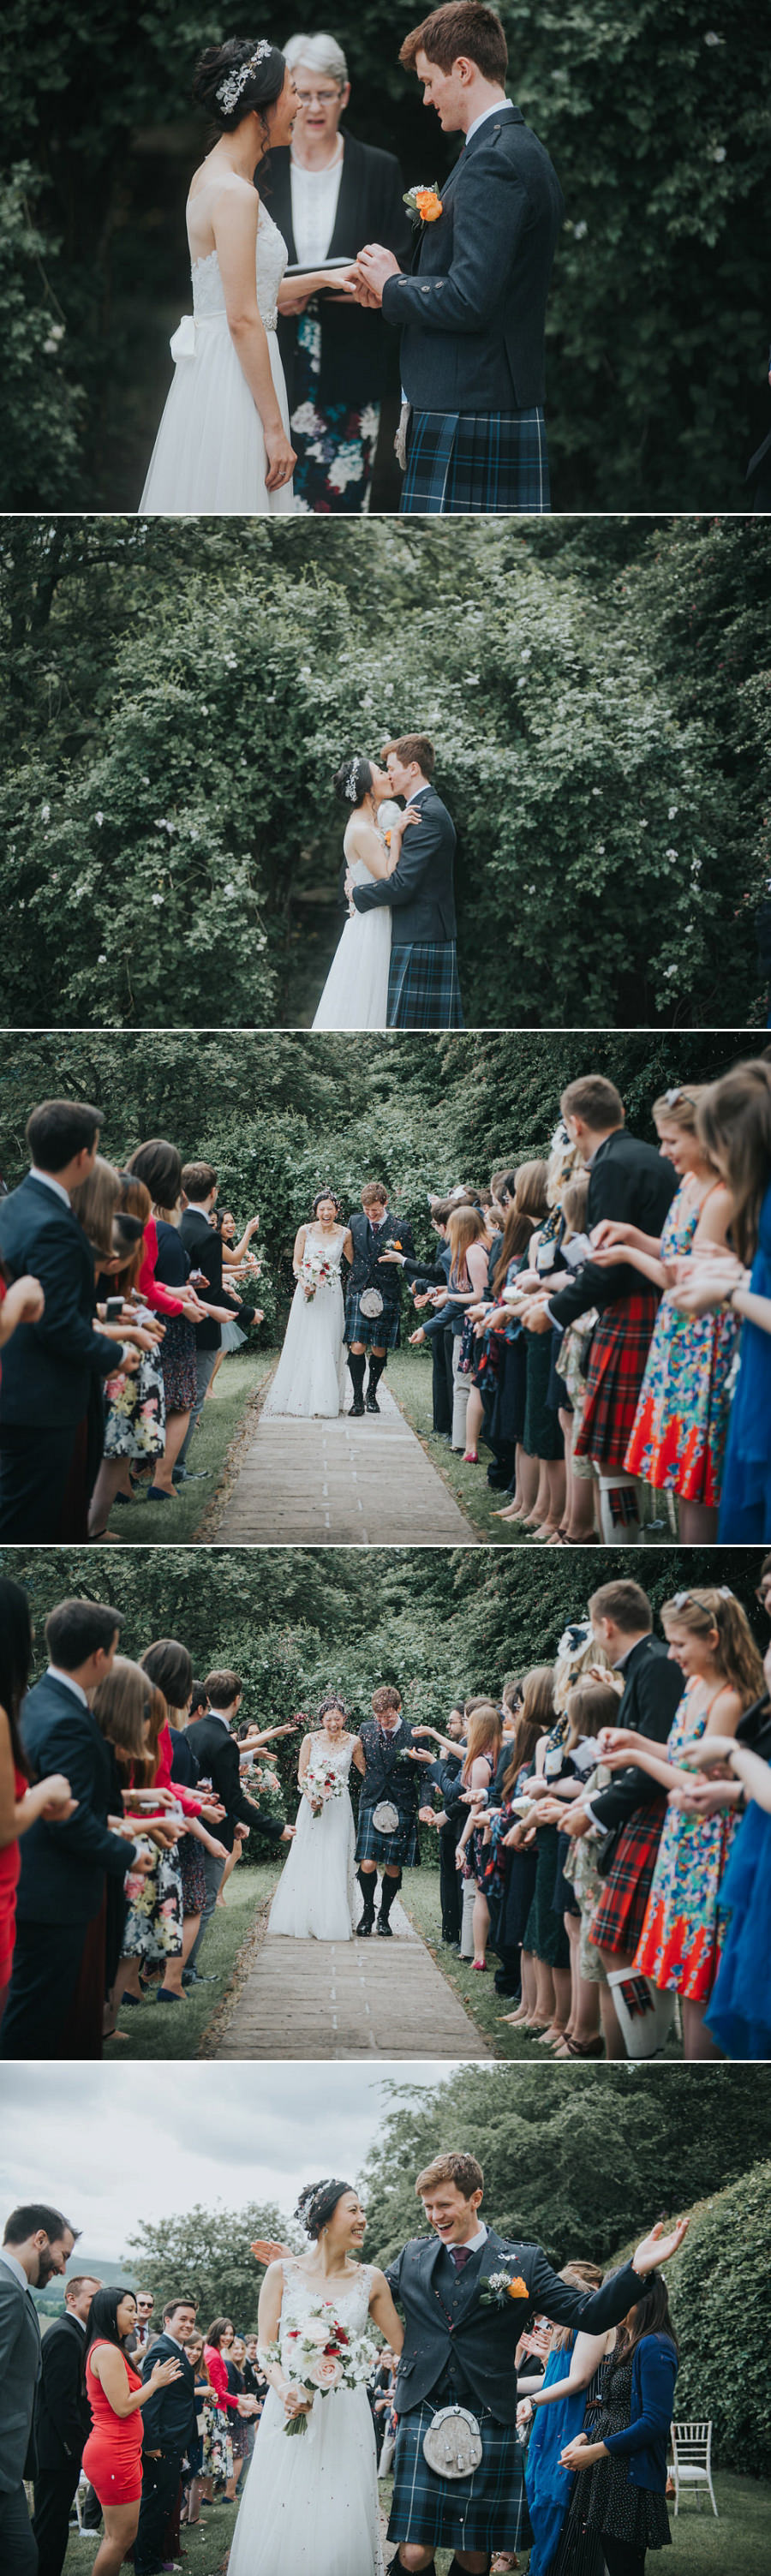 scottish-wedding-photography-vintage-photographer-022.jpg